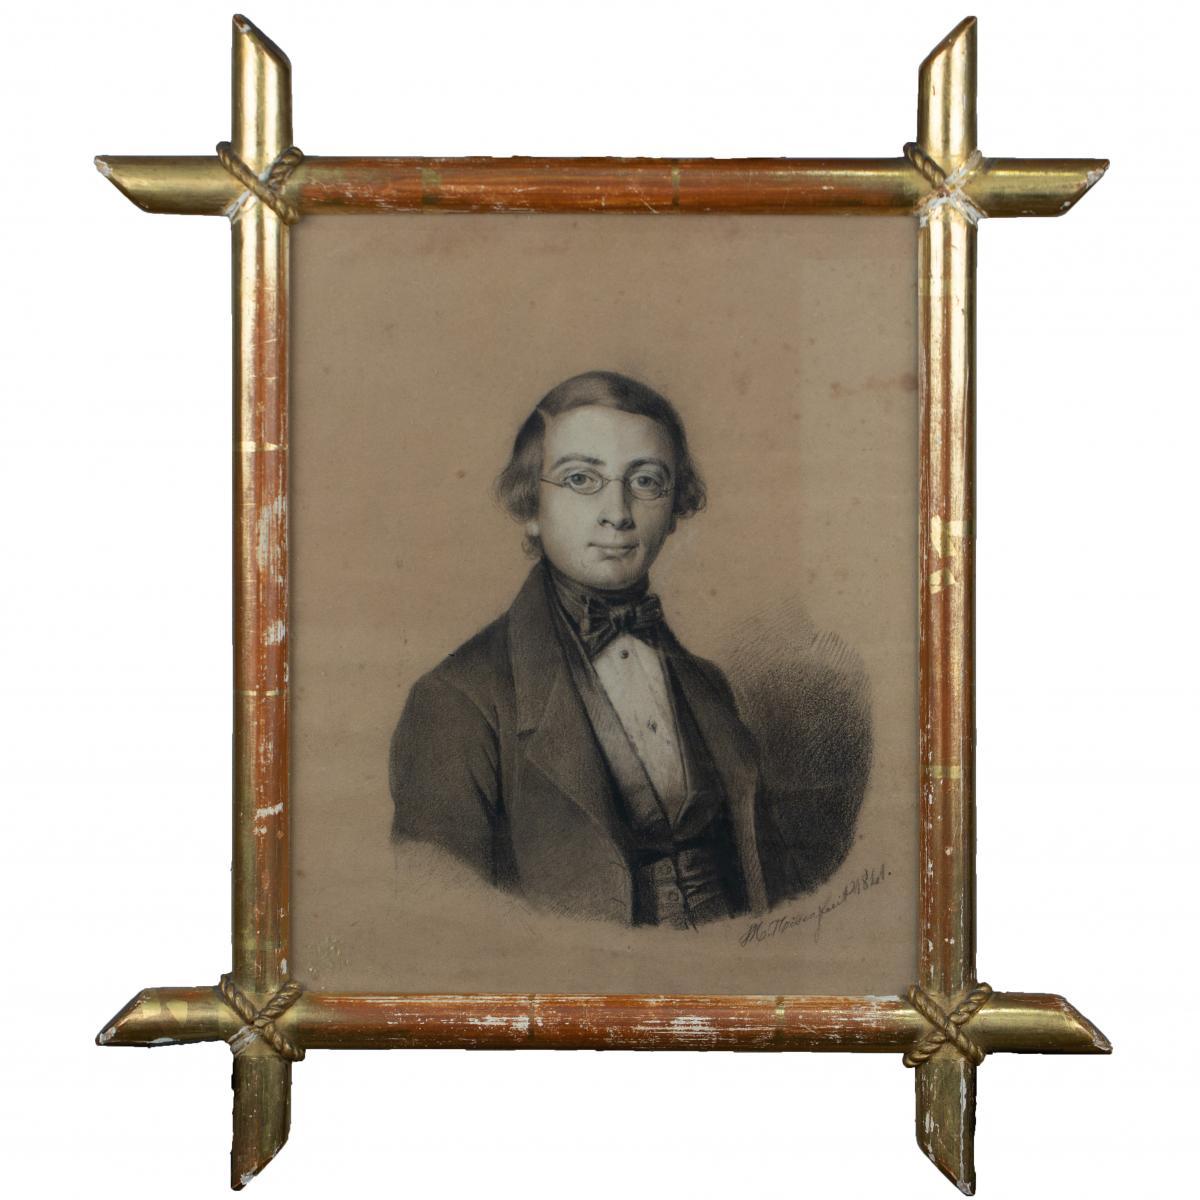 Drawing - Portrait Of Young Man - Jean-mathieu Nisen (francorchamps 1819 - Liege 1885)